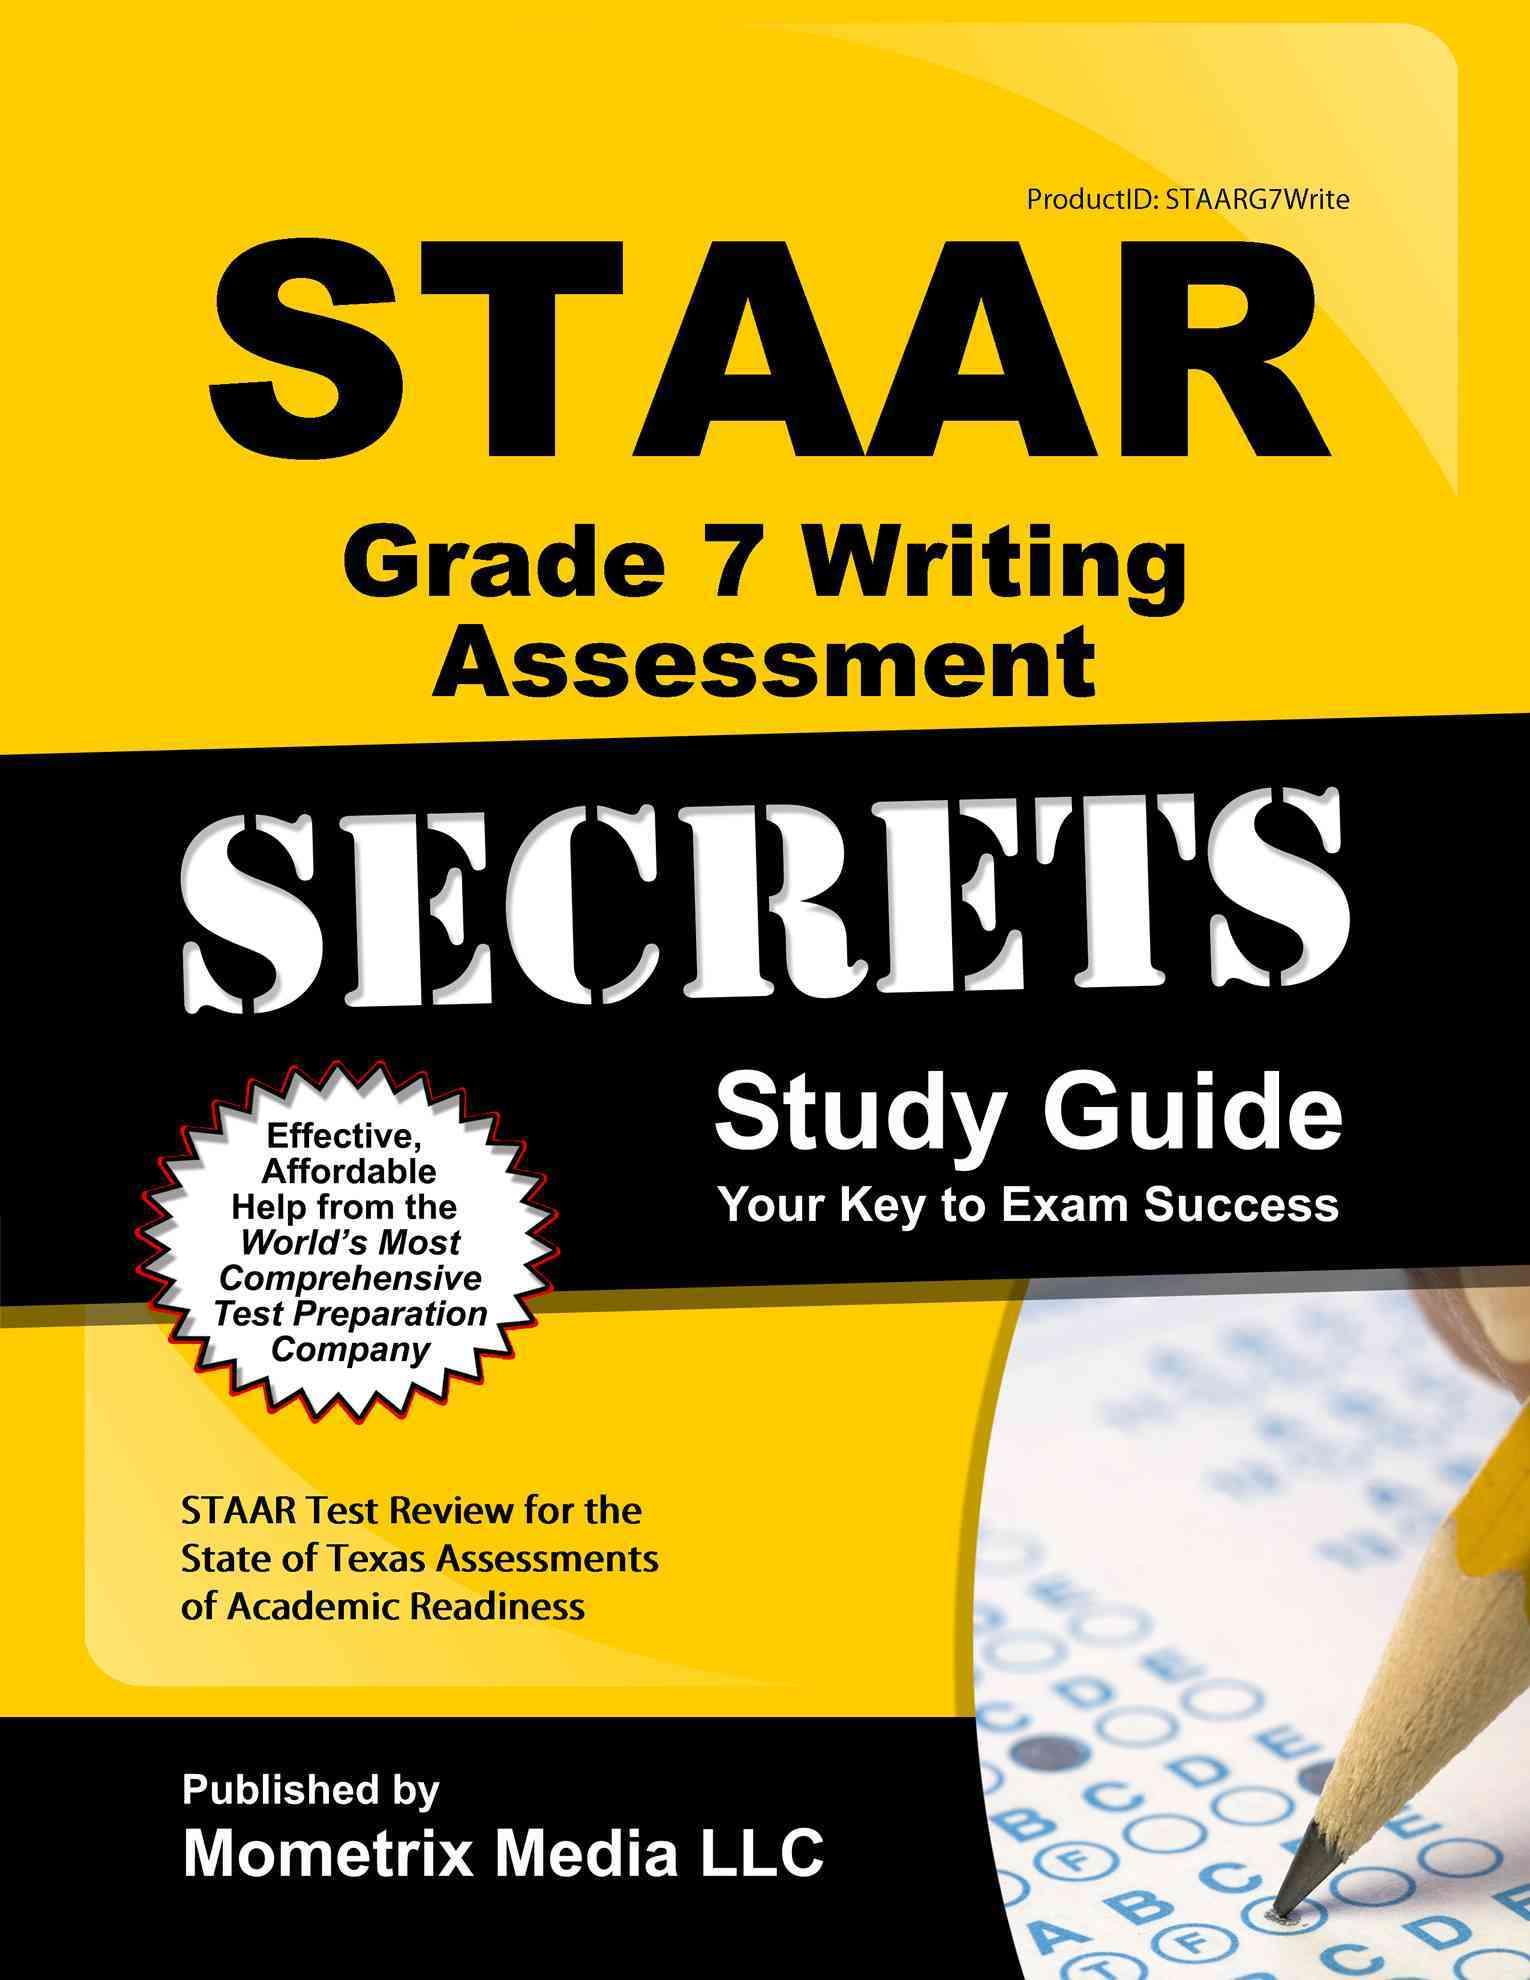 STAAR Grade 7 Writing Assessment Secrets Study Guide By Mometrix Media